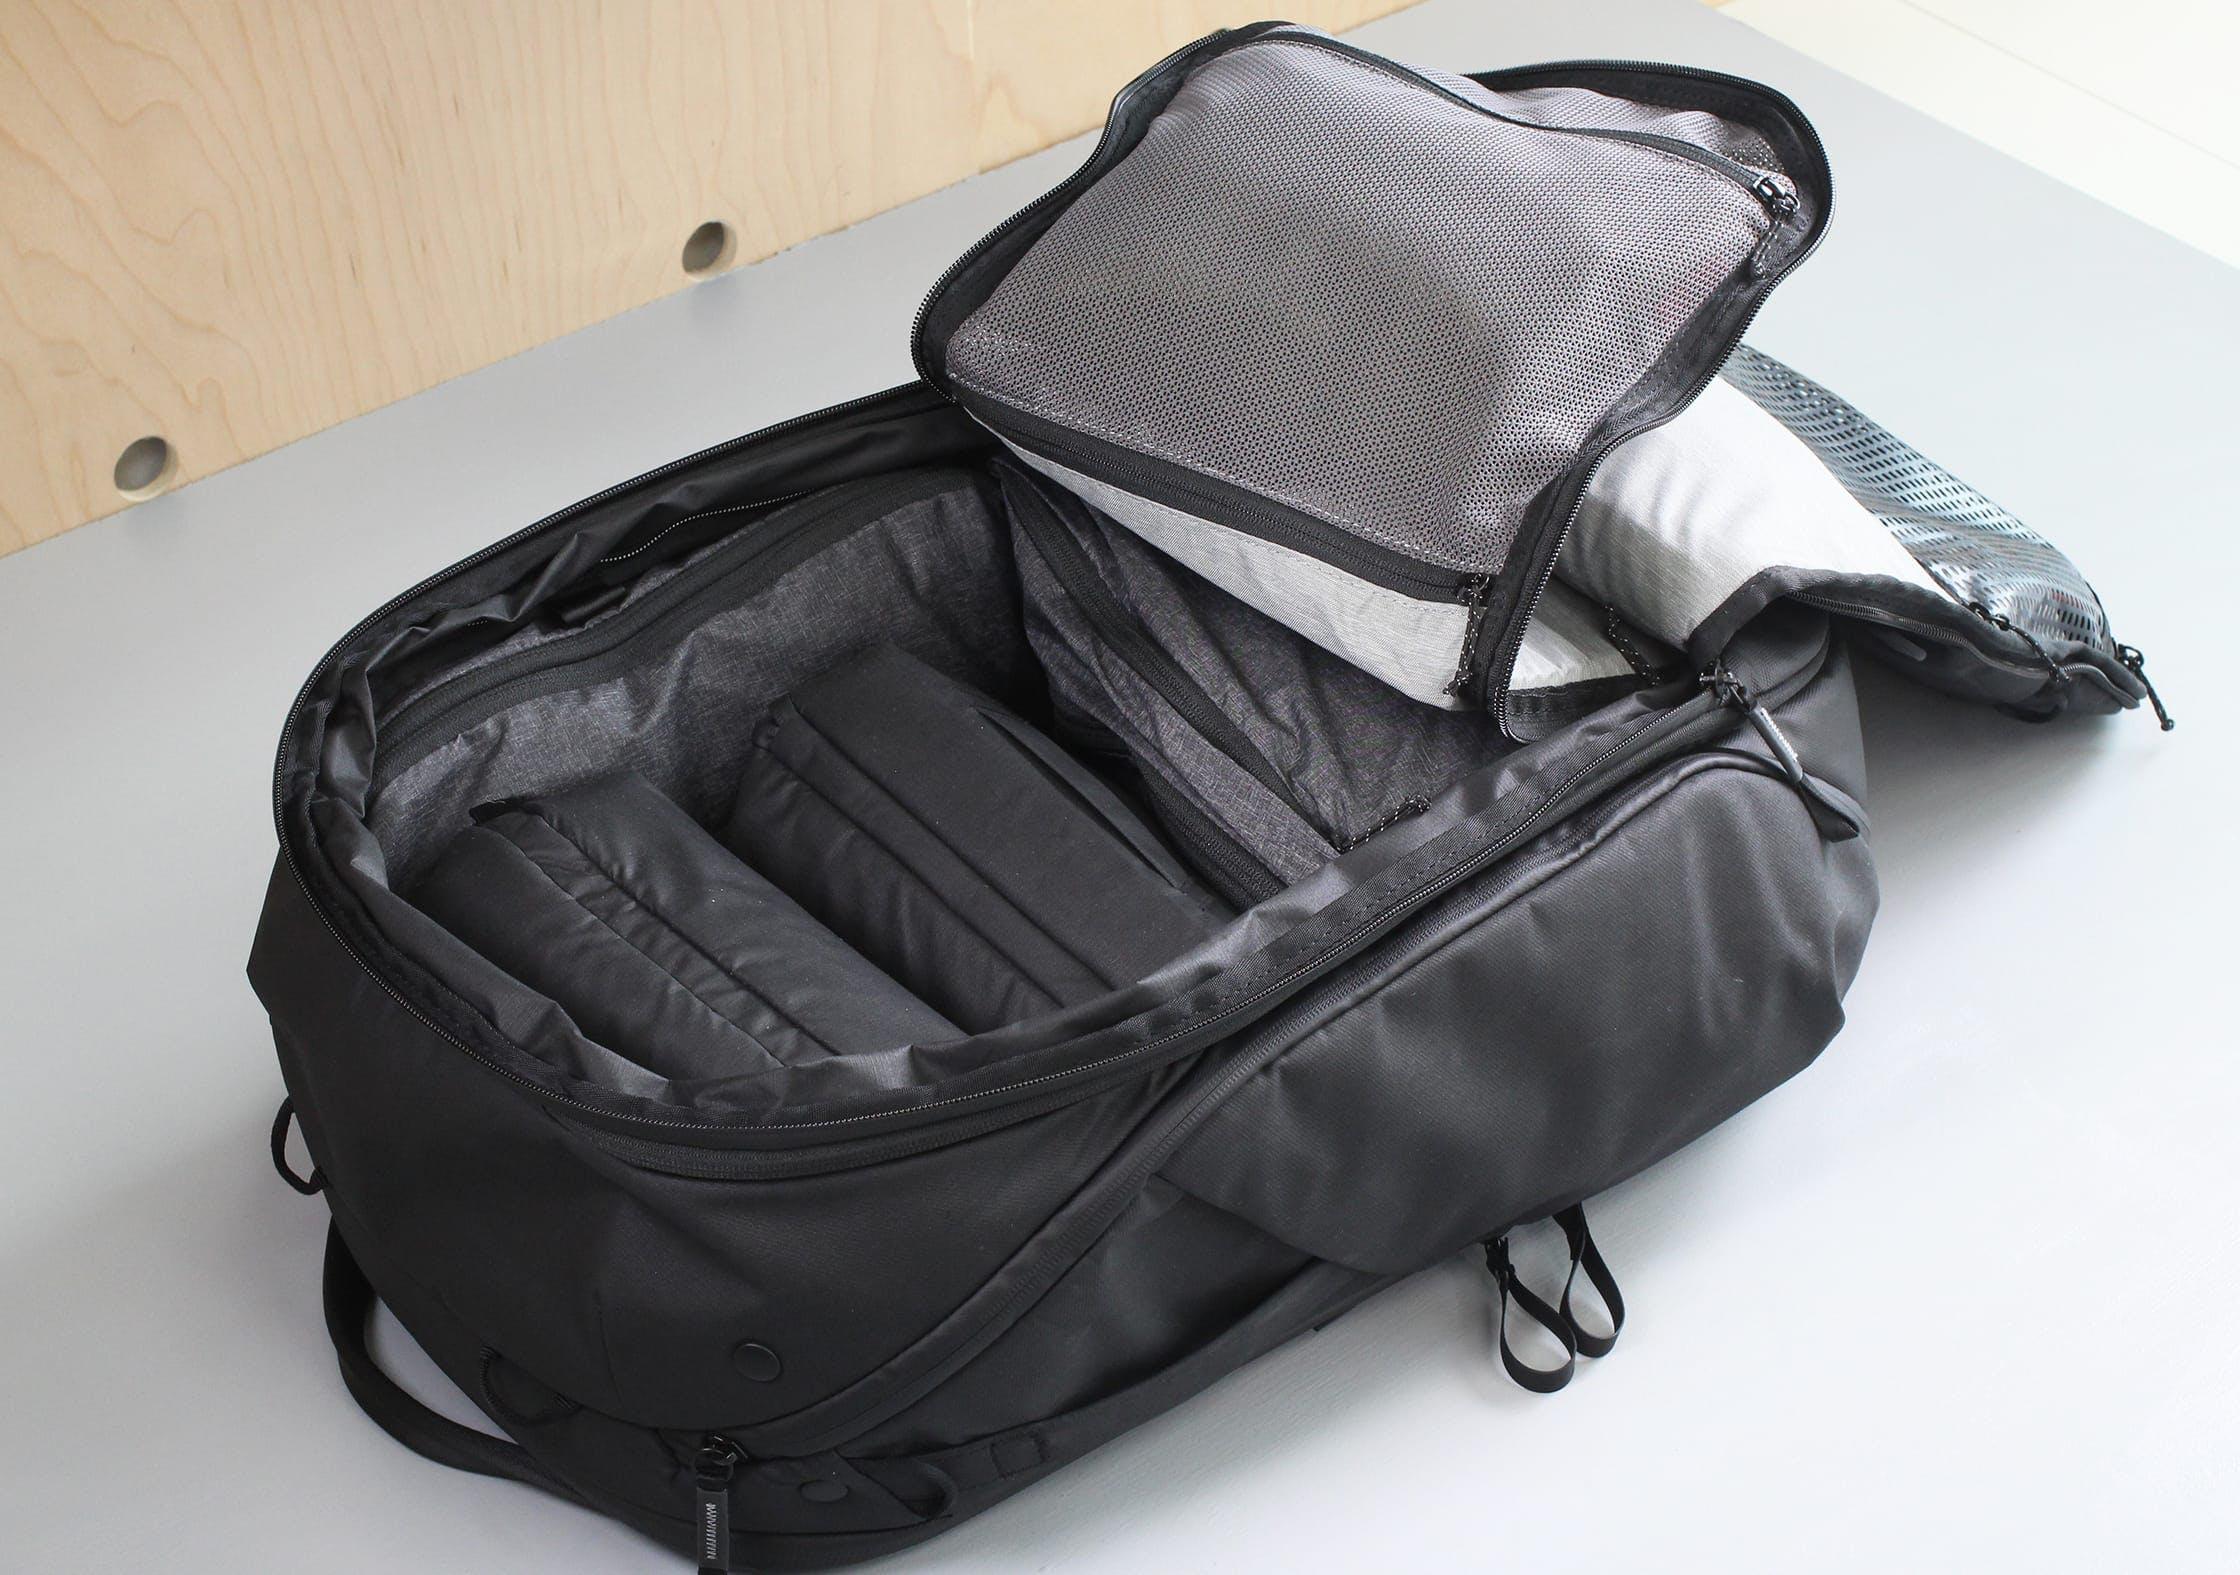 Peak Design Travel Backpack Main Compartment + Divider